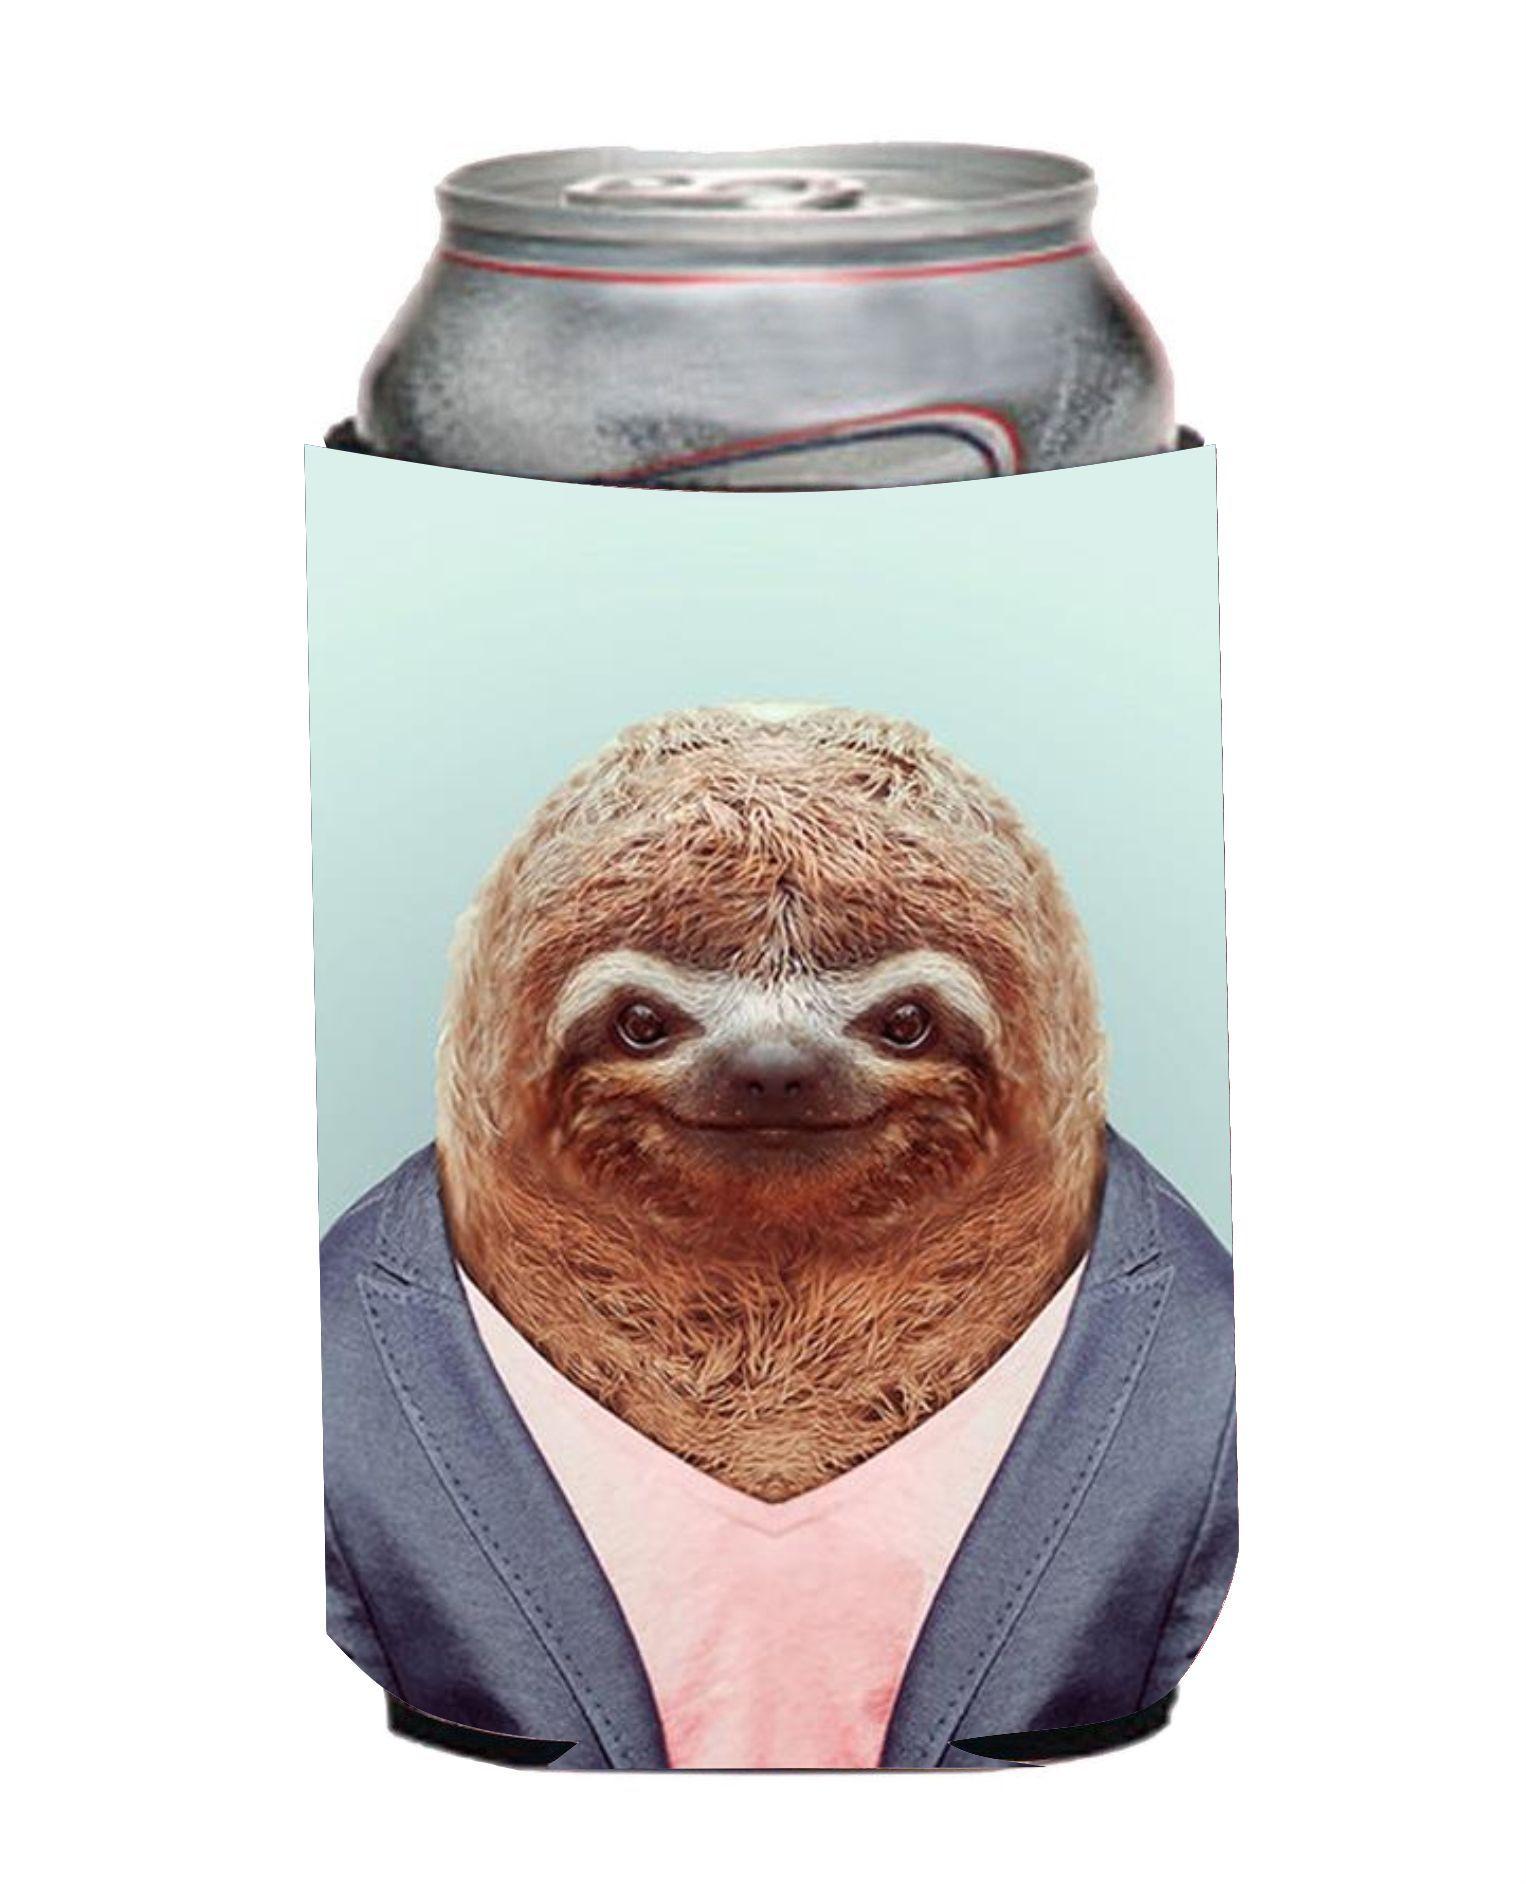 Hipster Sloth Koozie